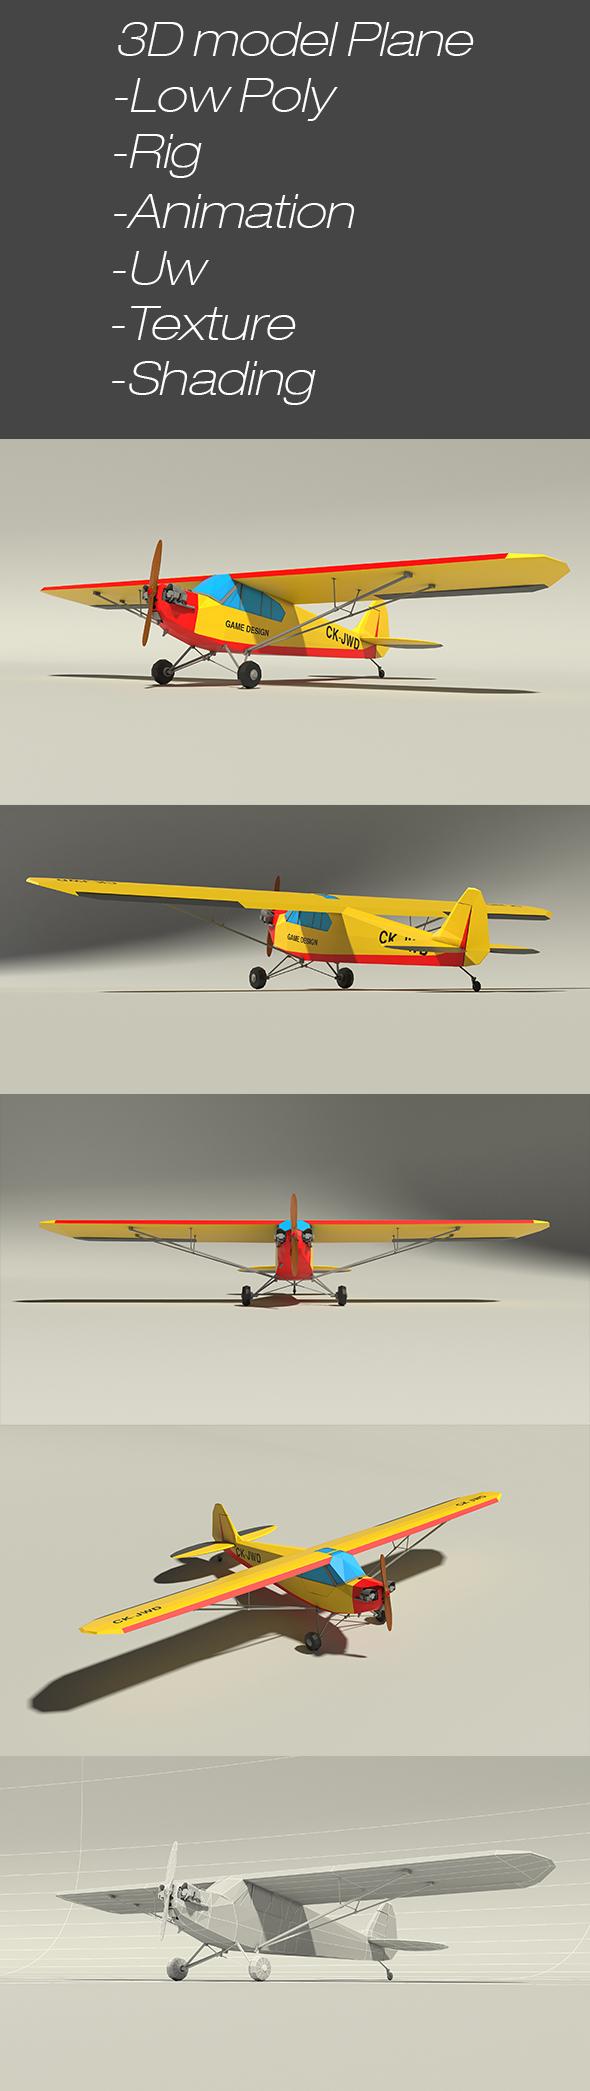 3D Model Plane with propeller - 3DOcean Item for Sale